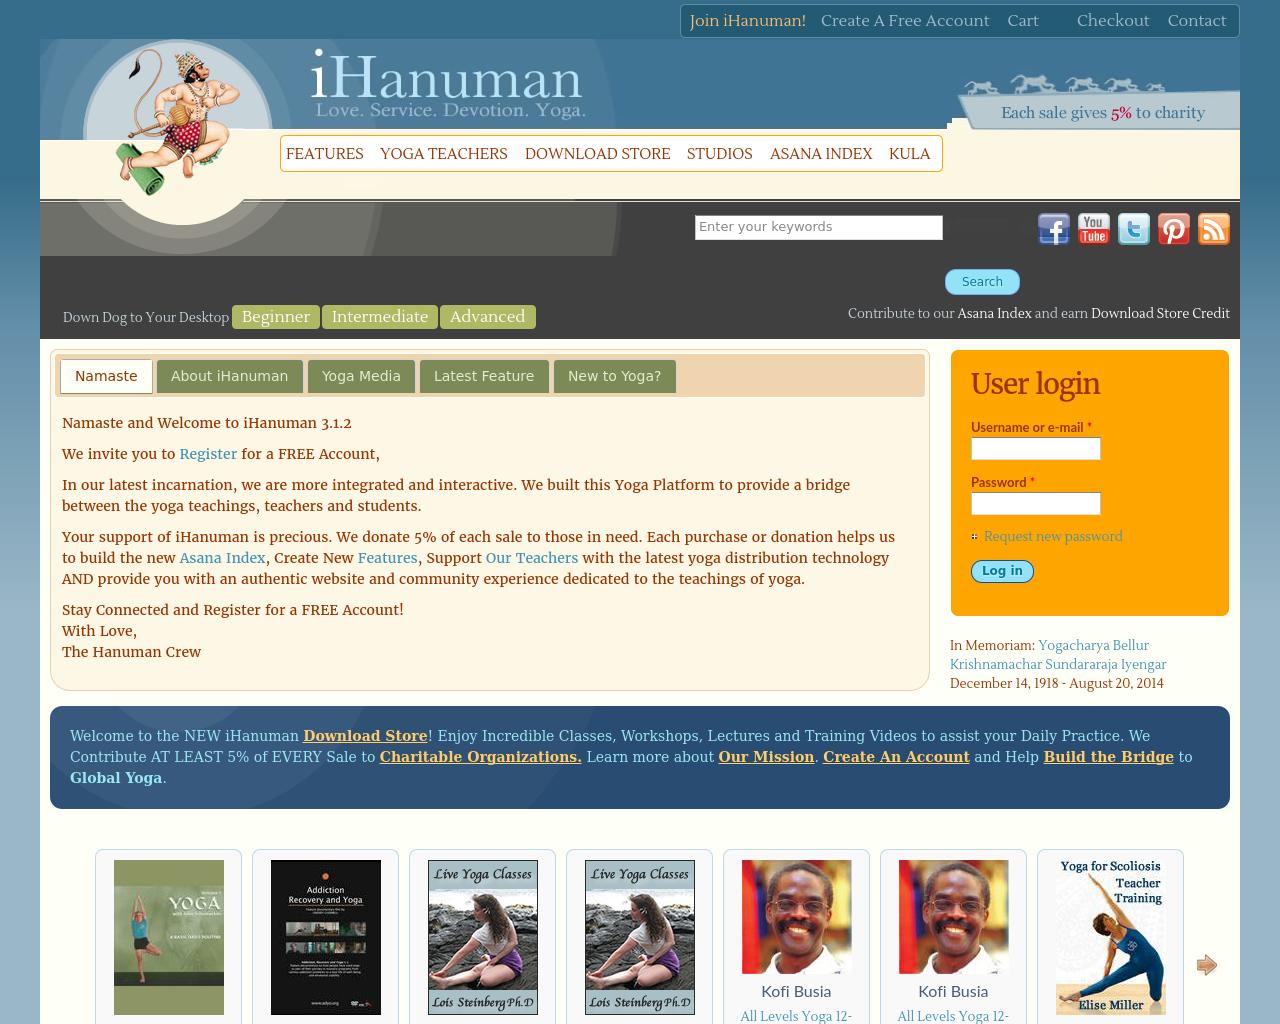 IHanuman-Advertising-Reviews-Pricing